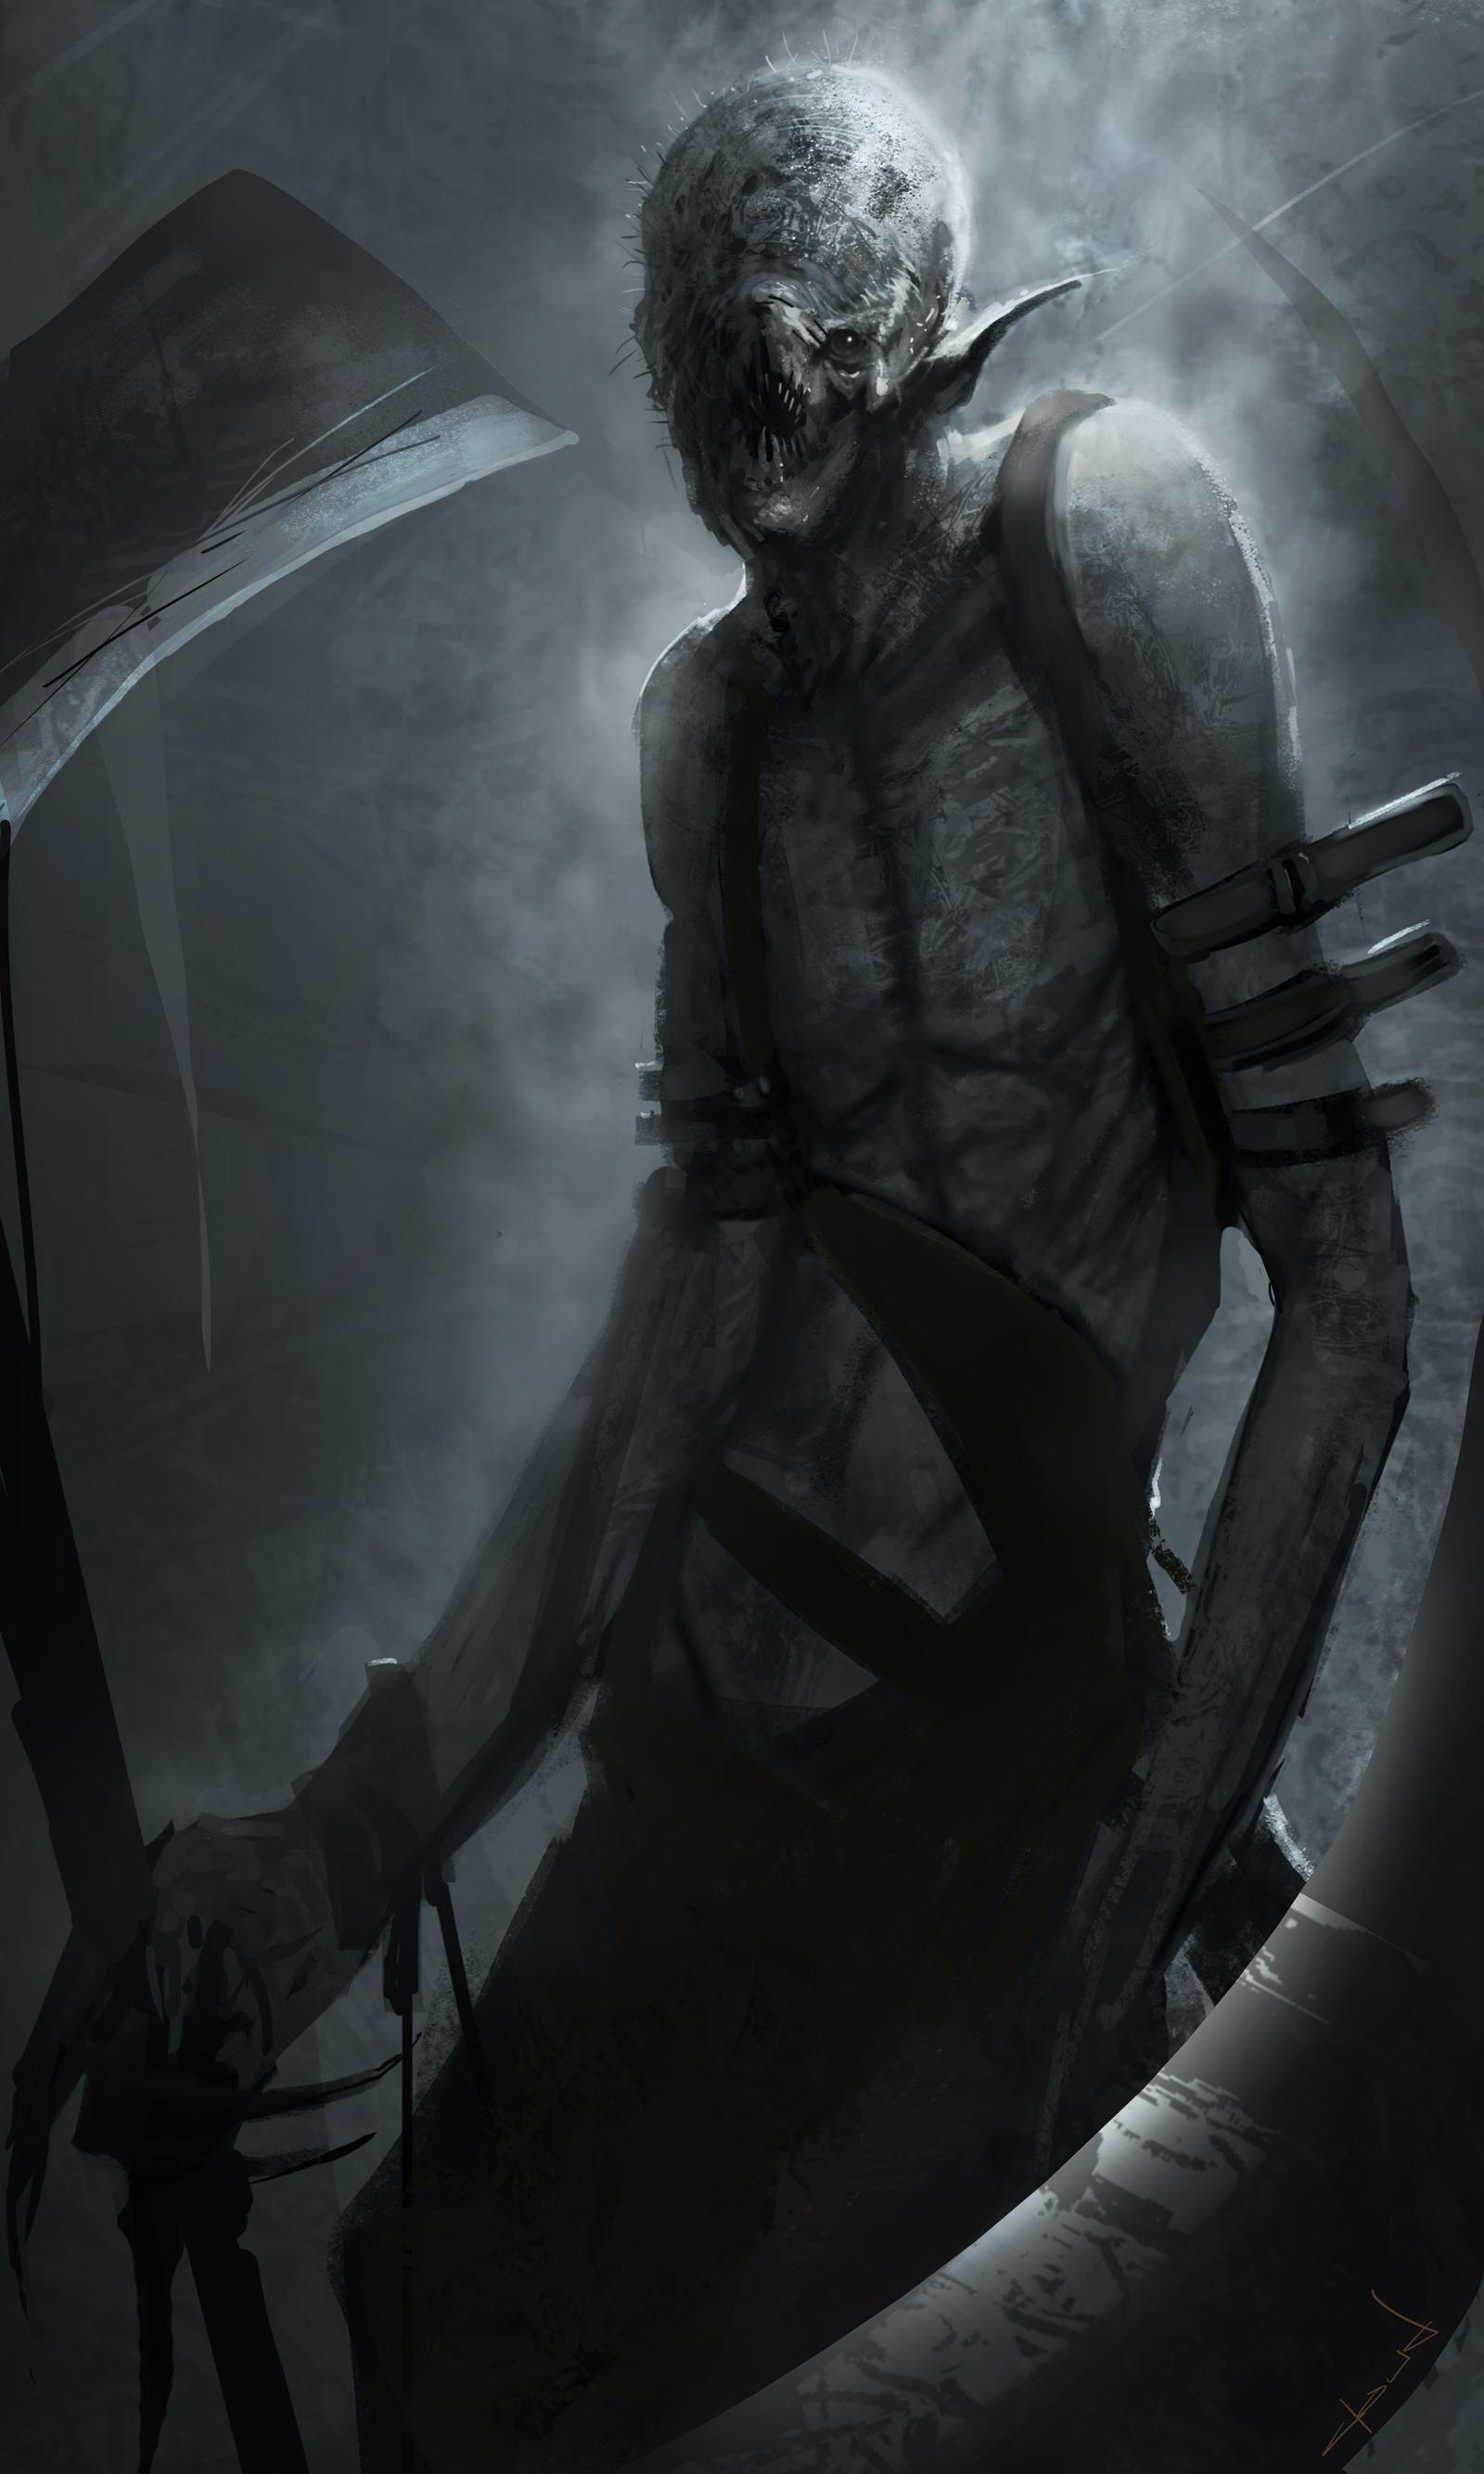 Freezin by Darkcloud013